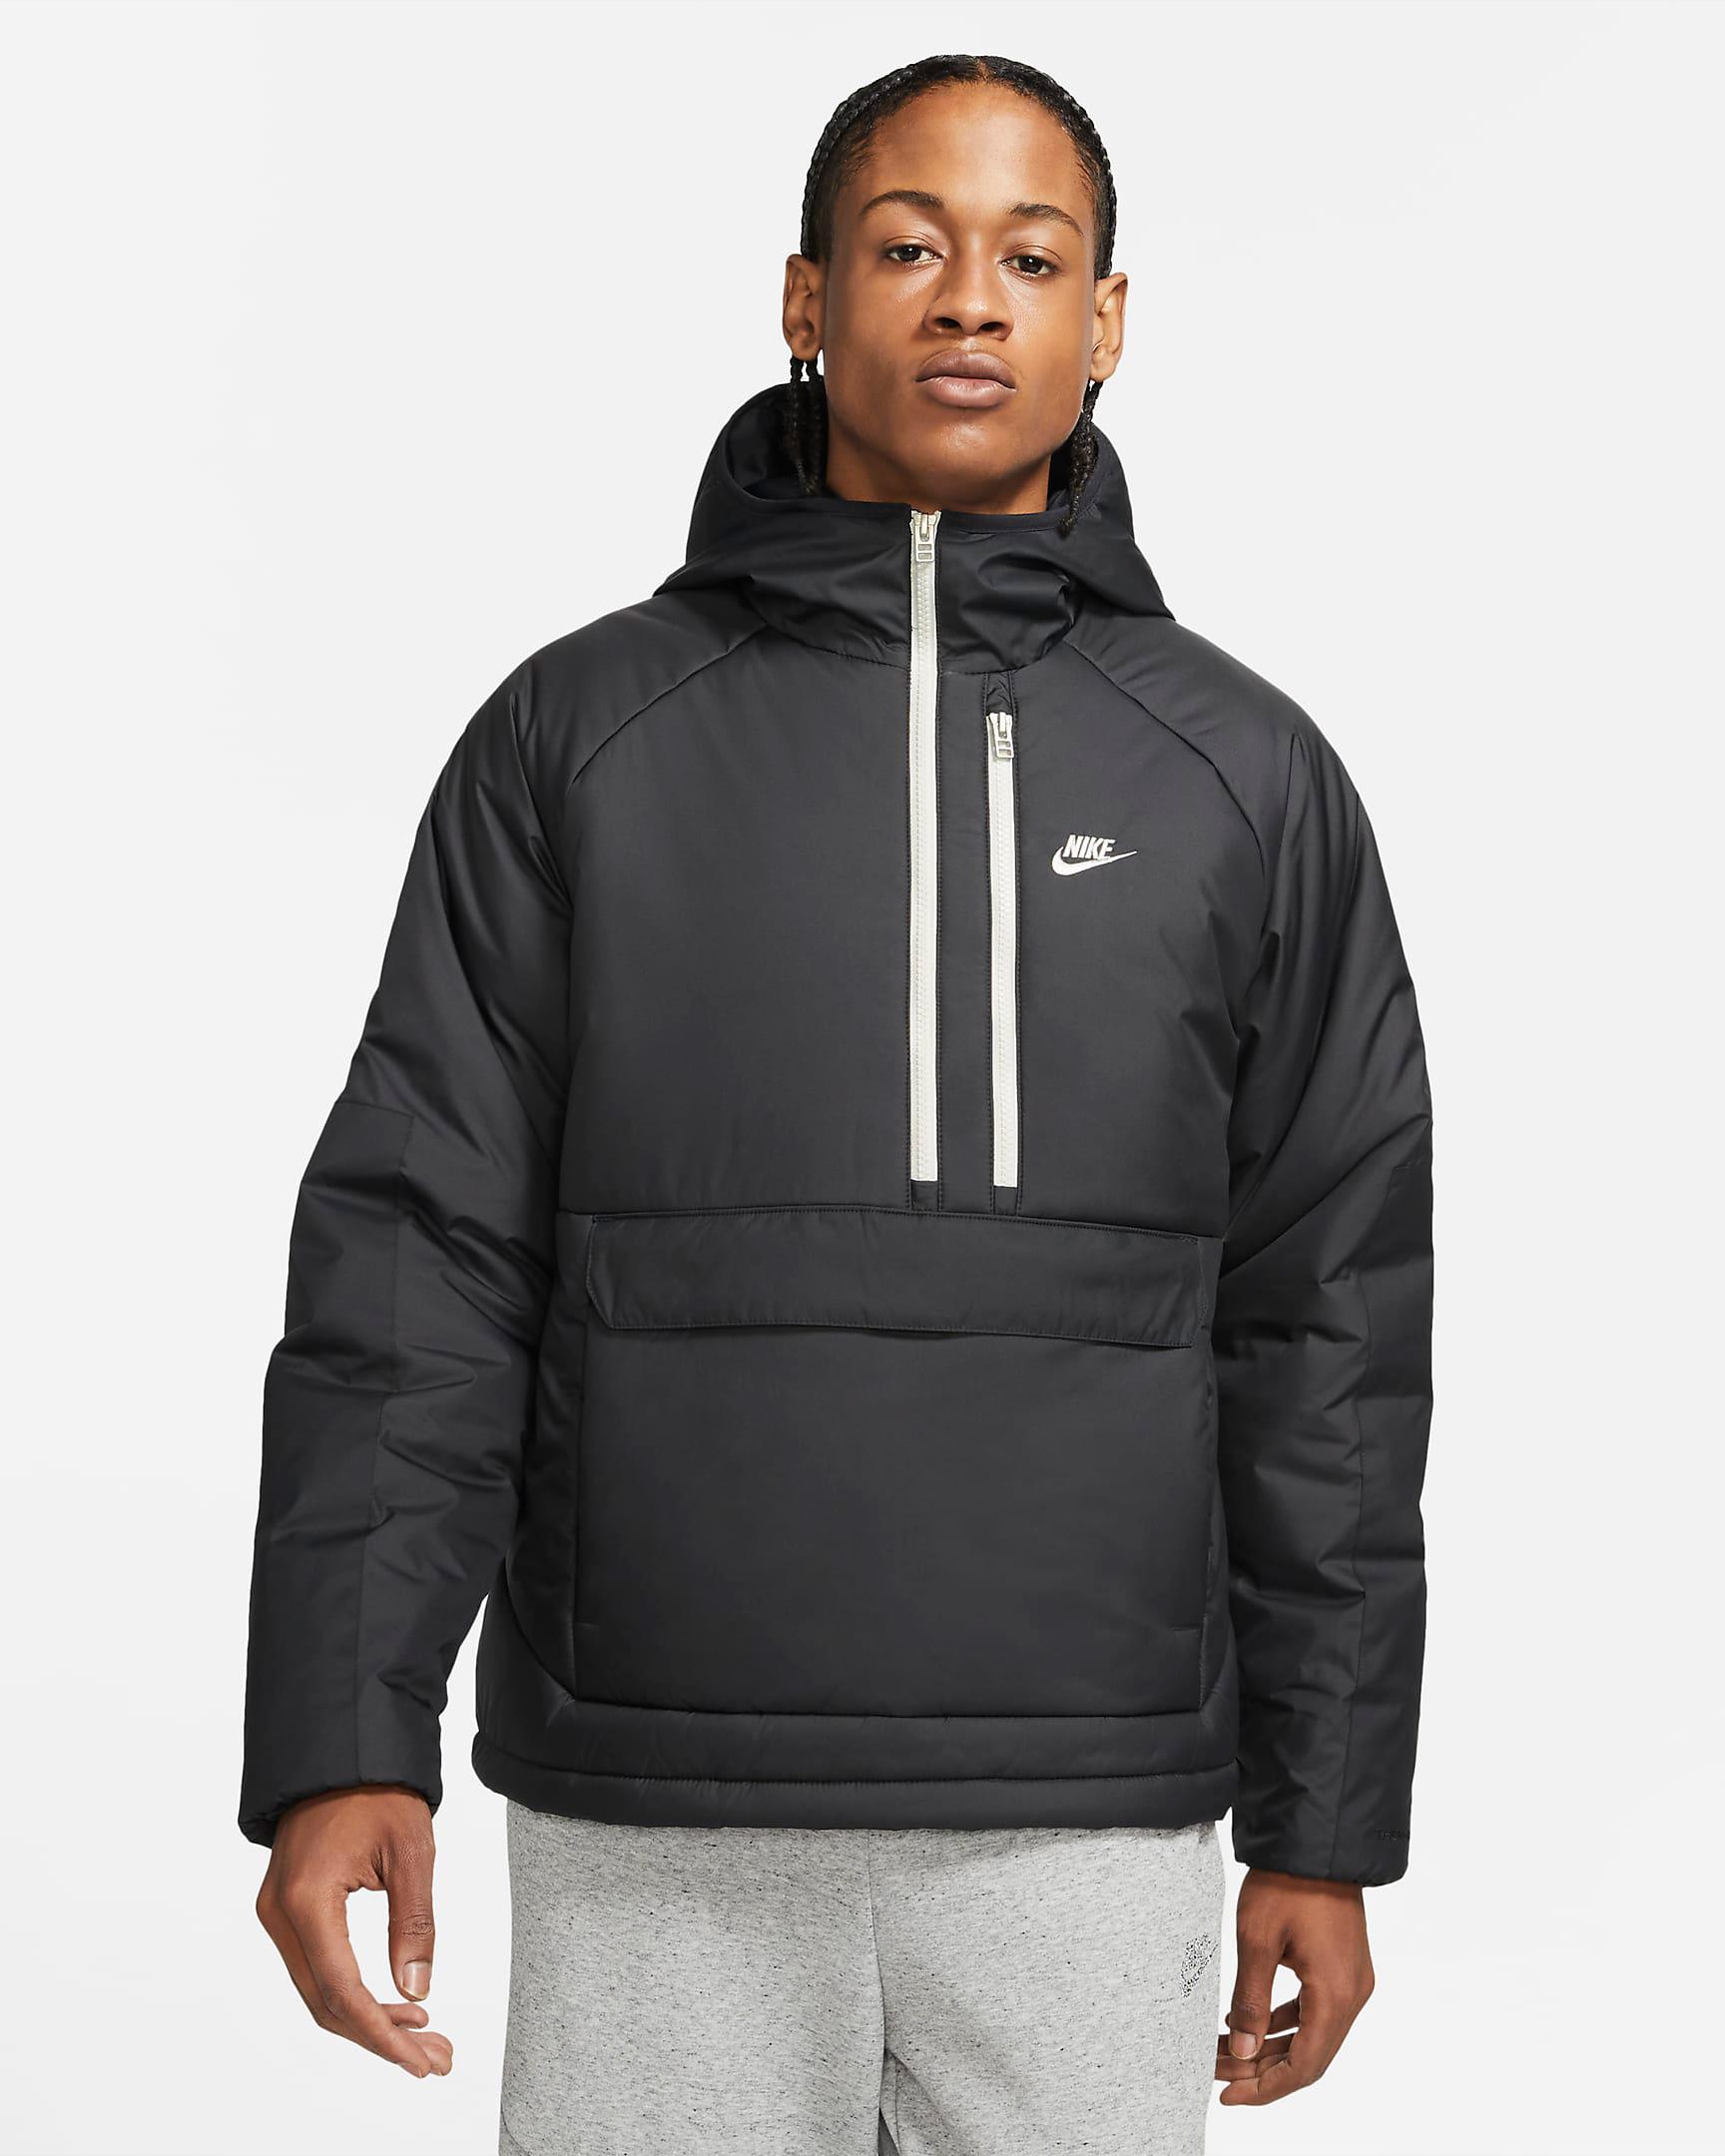 nike-sportswear-therma-fit-legacy-hooded-anorak-jacket-black-sail